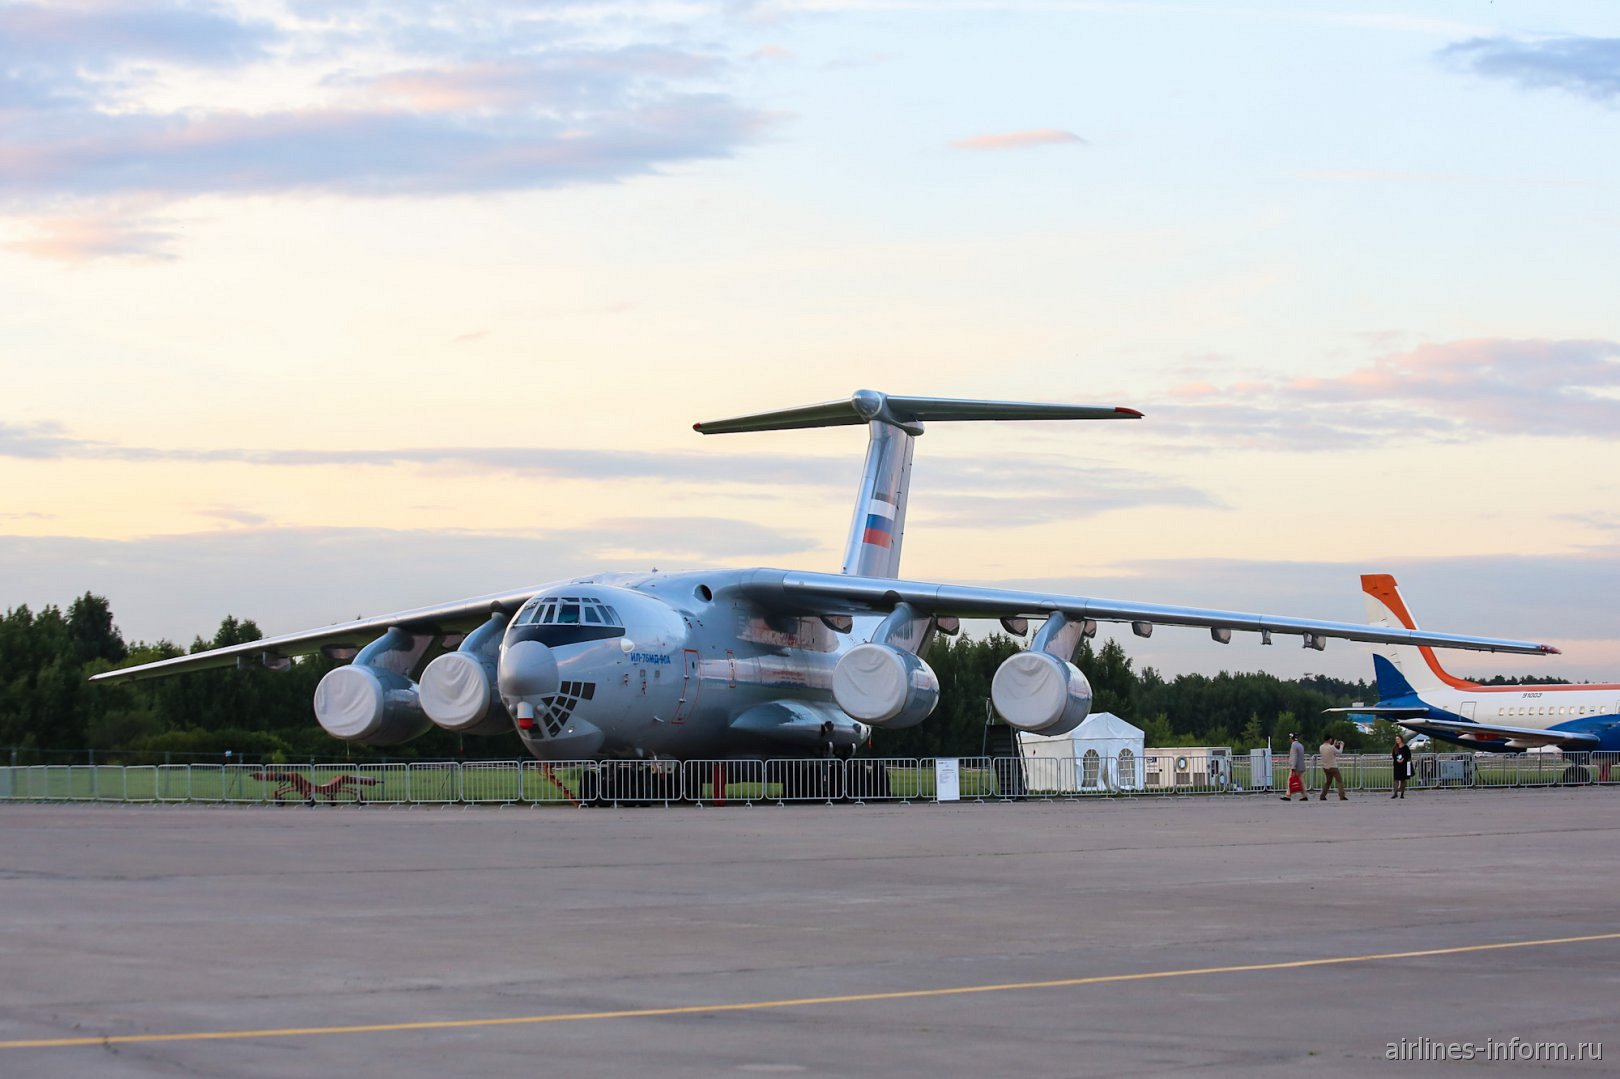 Самолет Ил-76МД-90 на авиасалоне МАКС-2017